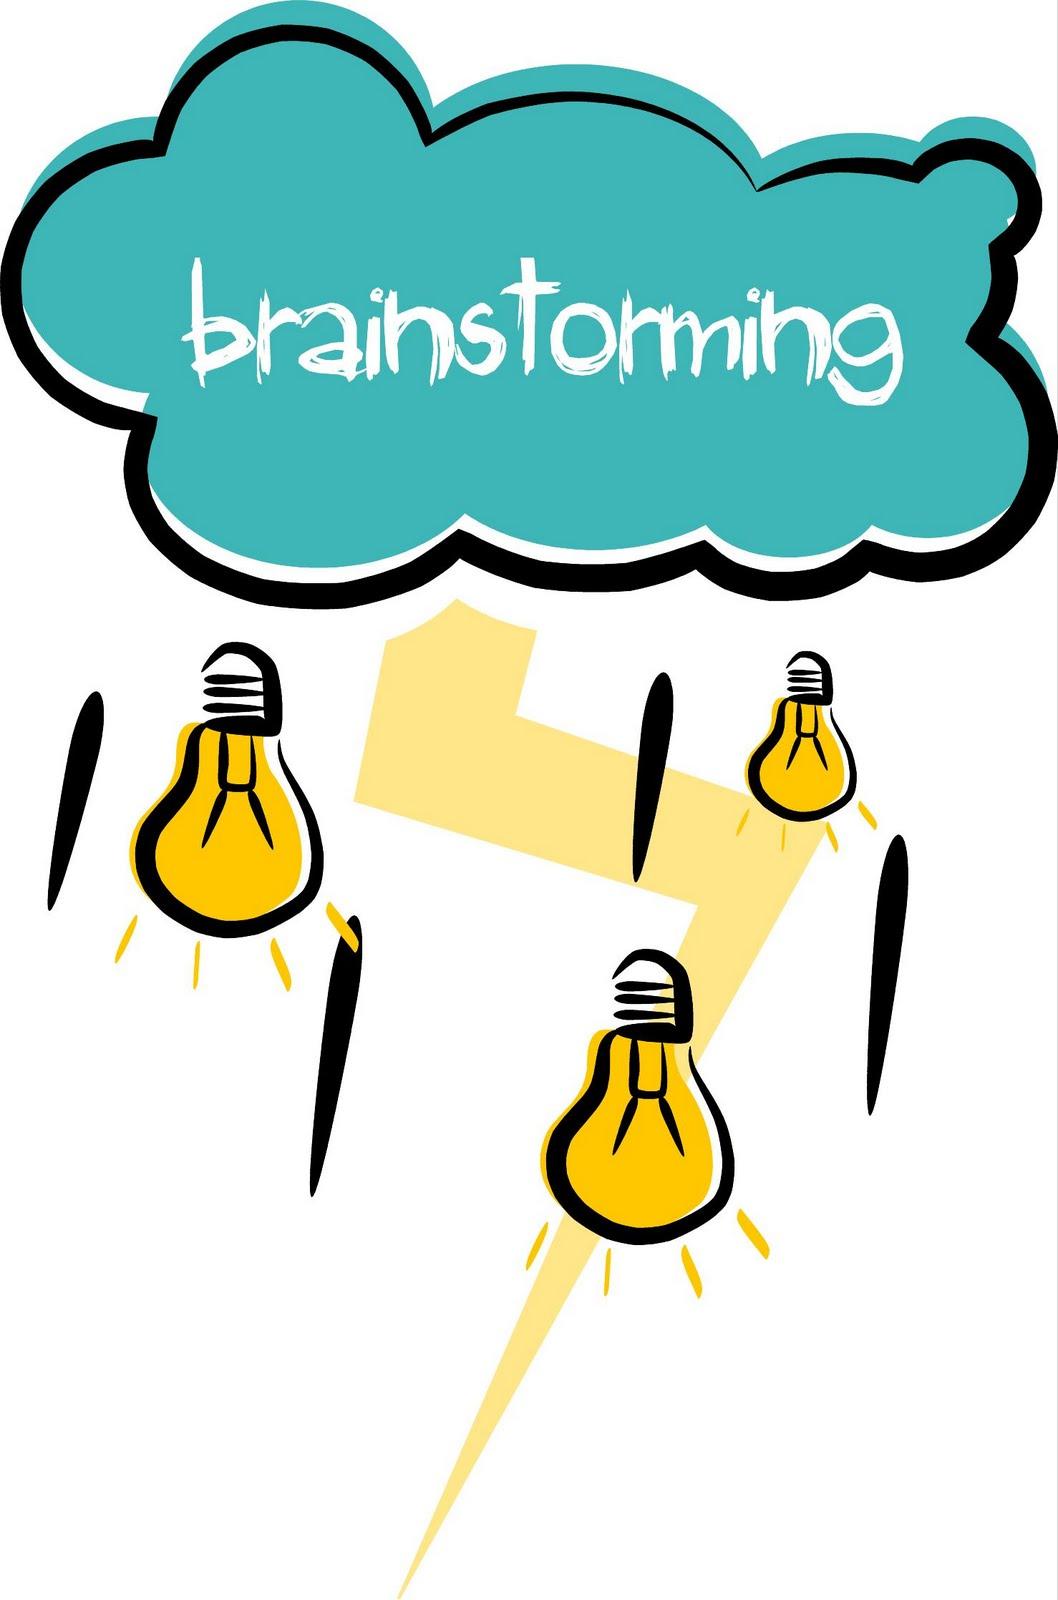 Brainstorming clipart